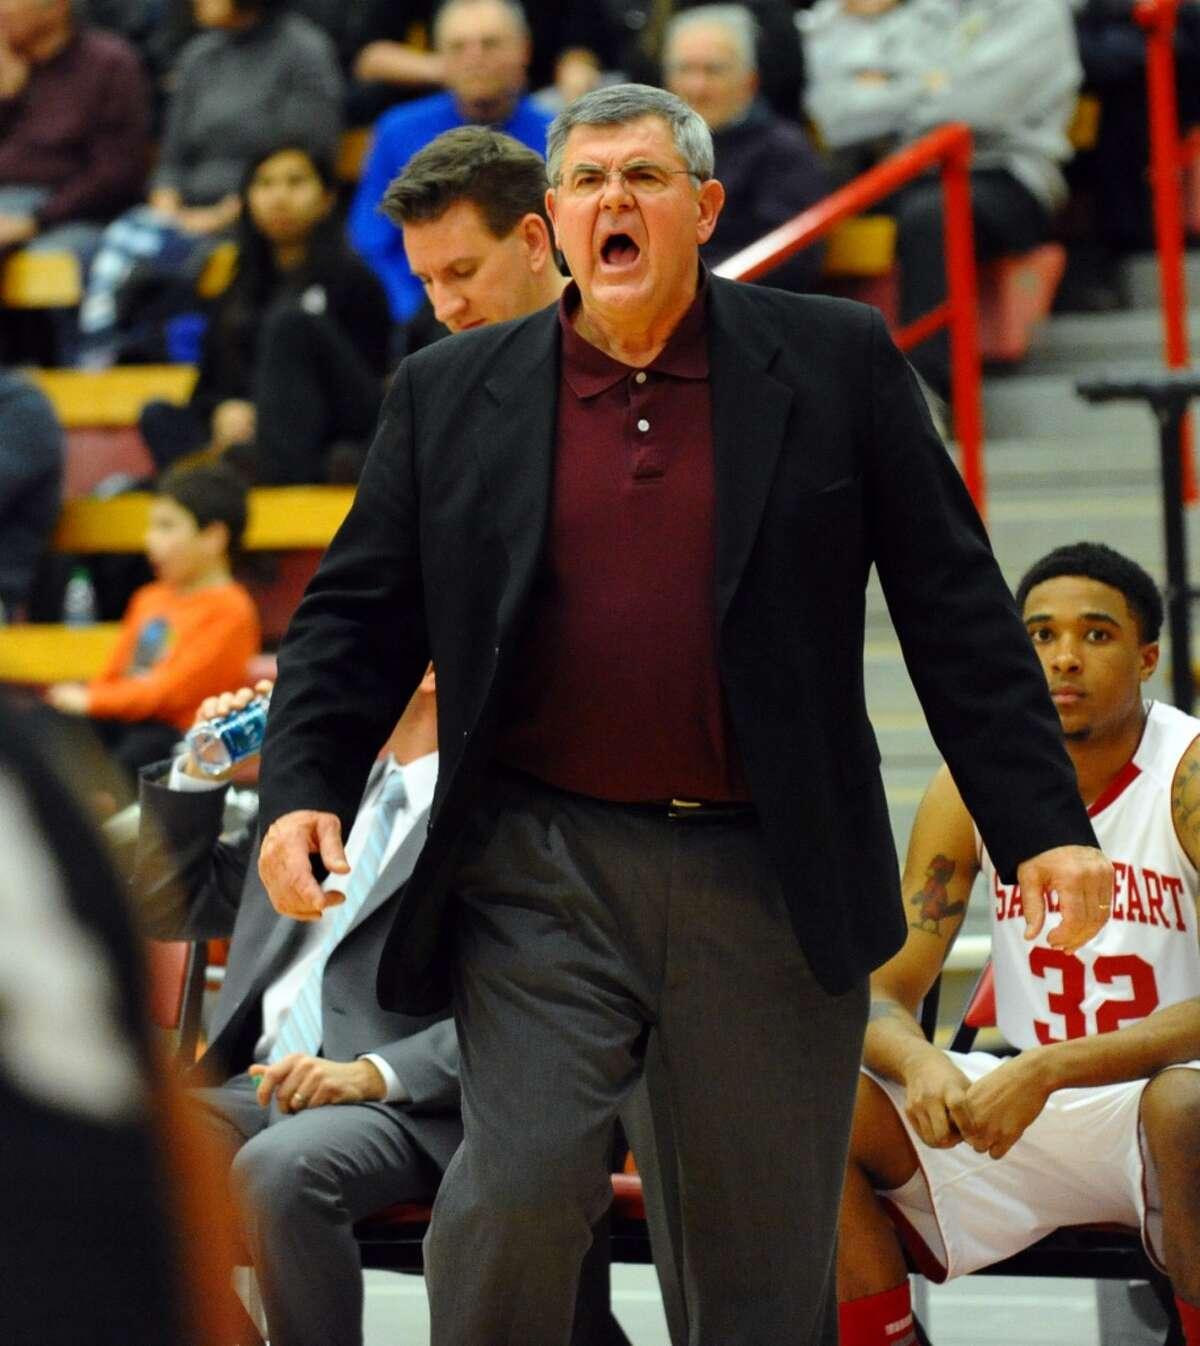 Sacred Heart Head Coach Dave Bike, during men's basketball action against Bryant at Sacred Heart University in Fairfield, Conn. on Thursday January 24, 2013.